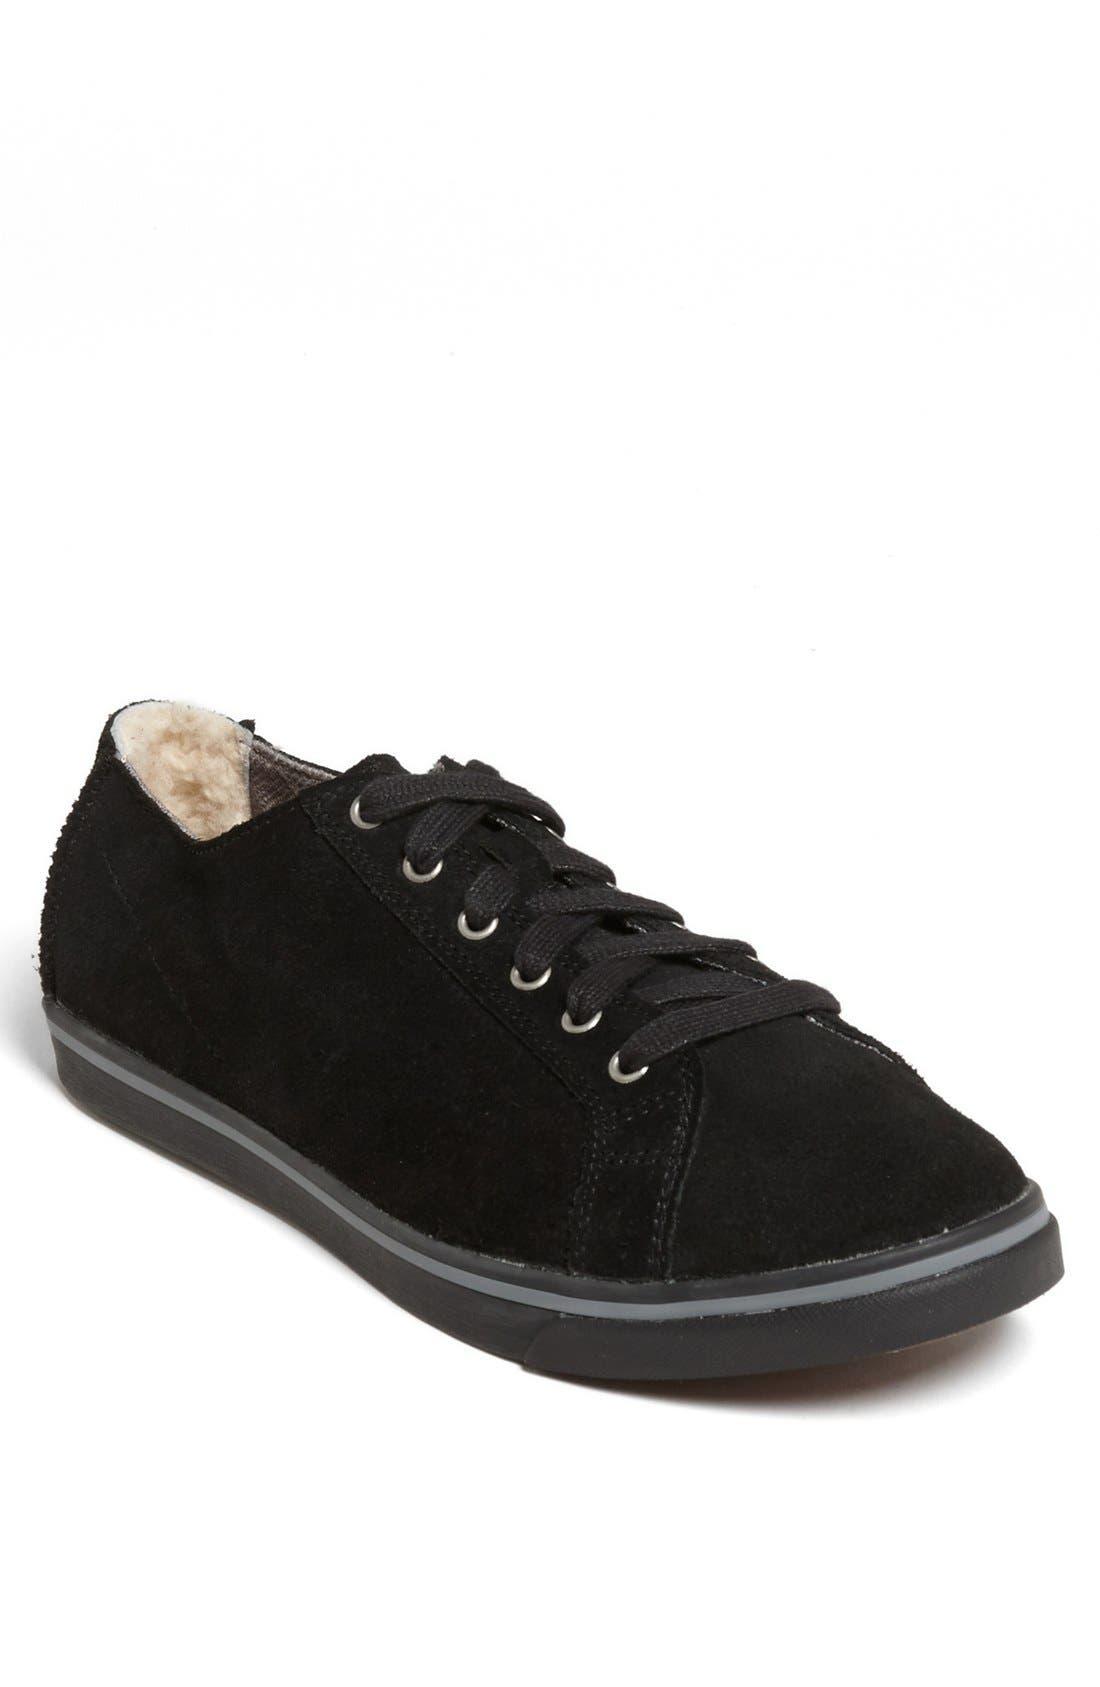 Australia 'Vanowen' Sneaker,                             Main thumbnail 1, color,                             001